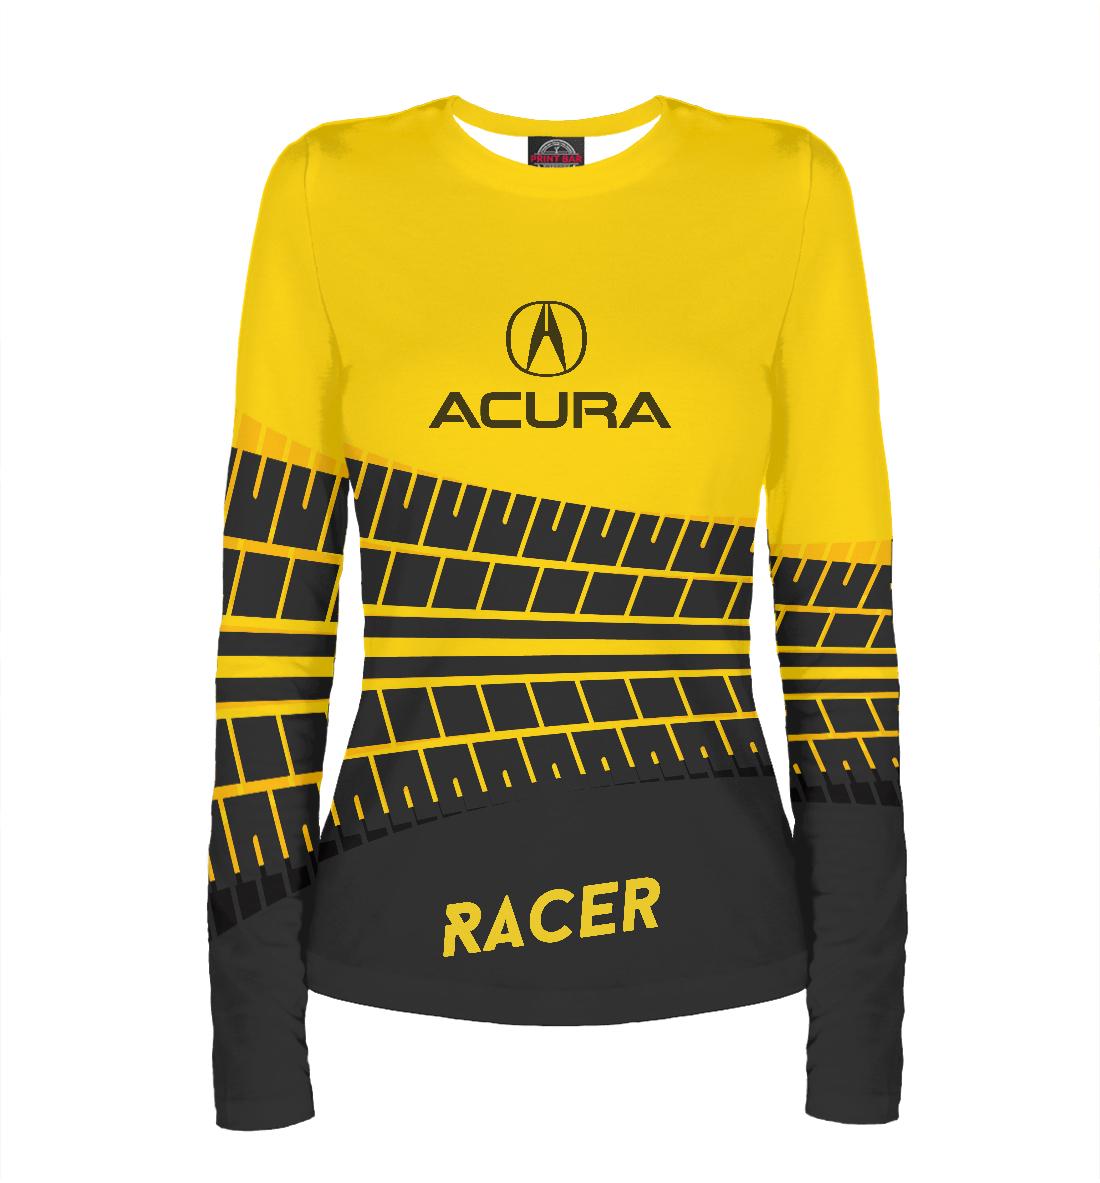 Лонгслив Acura racer